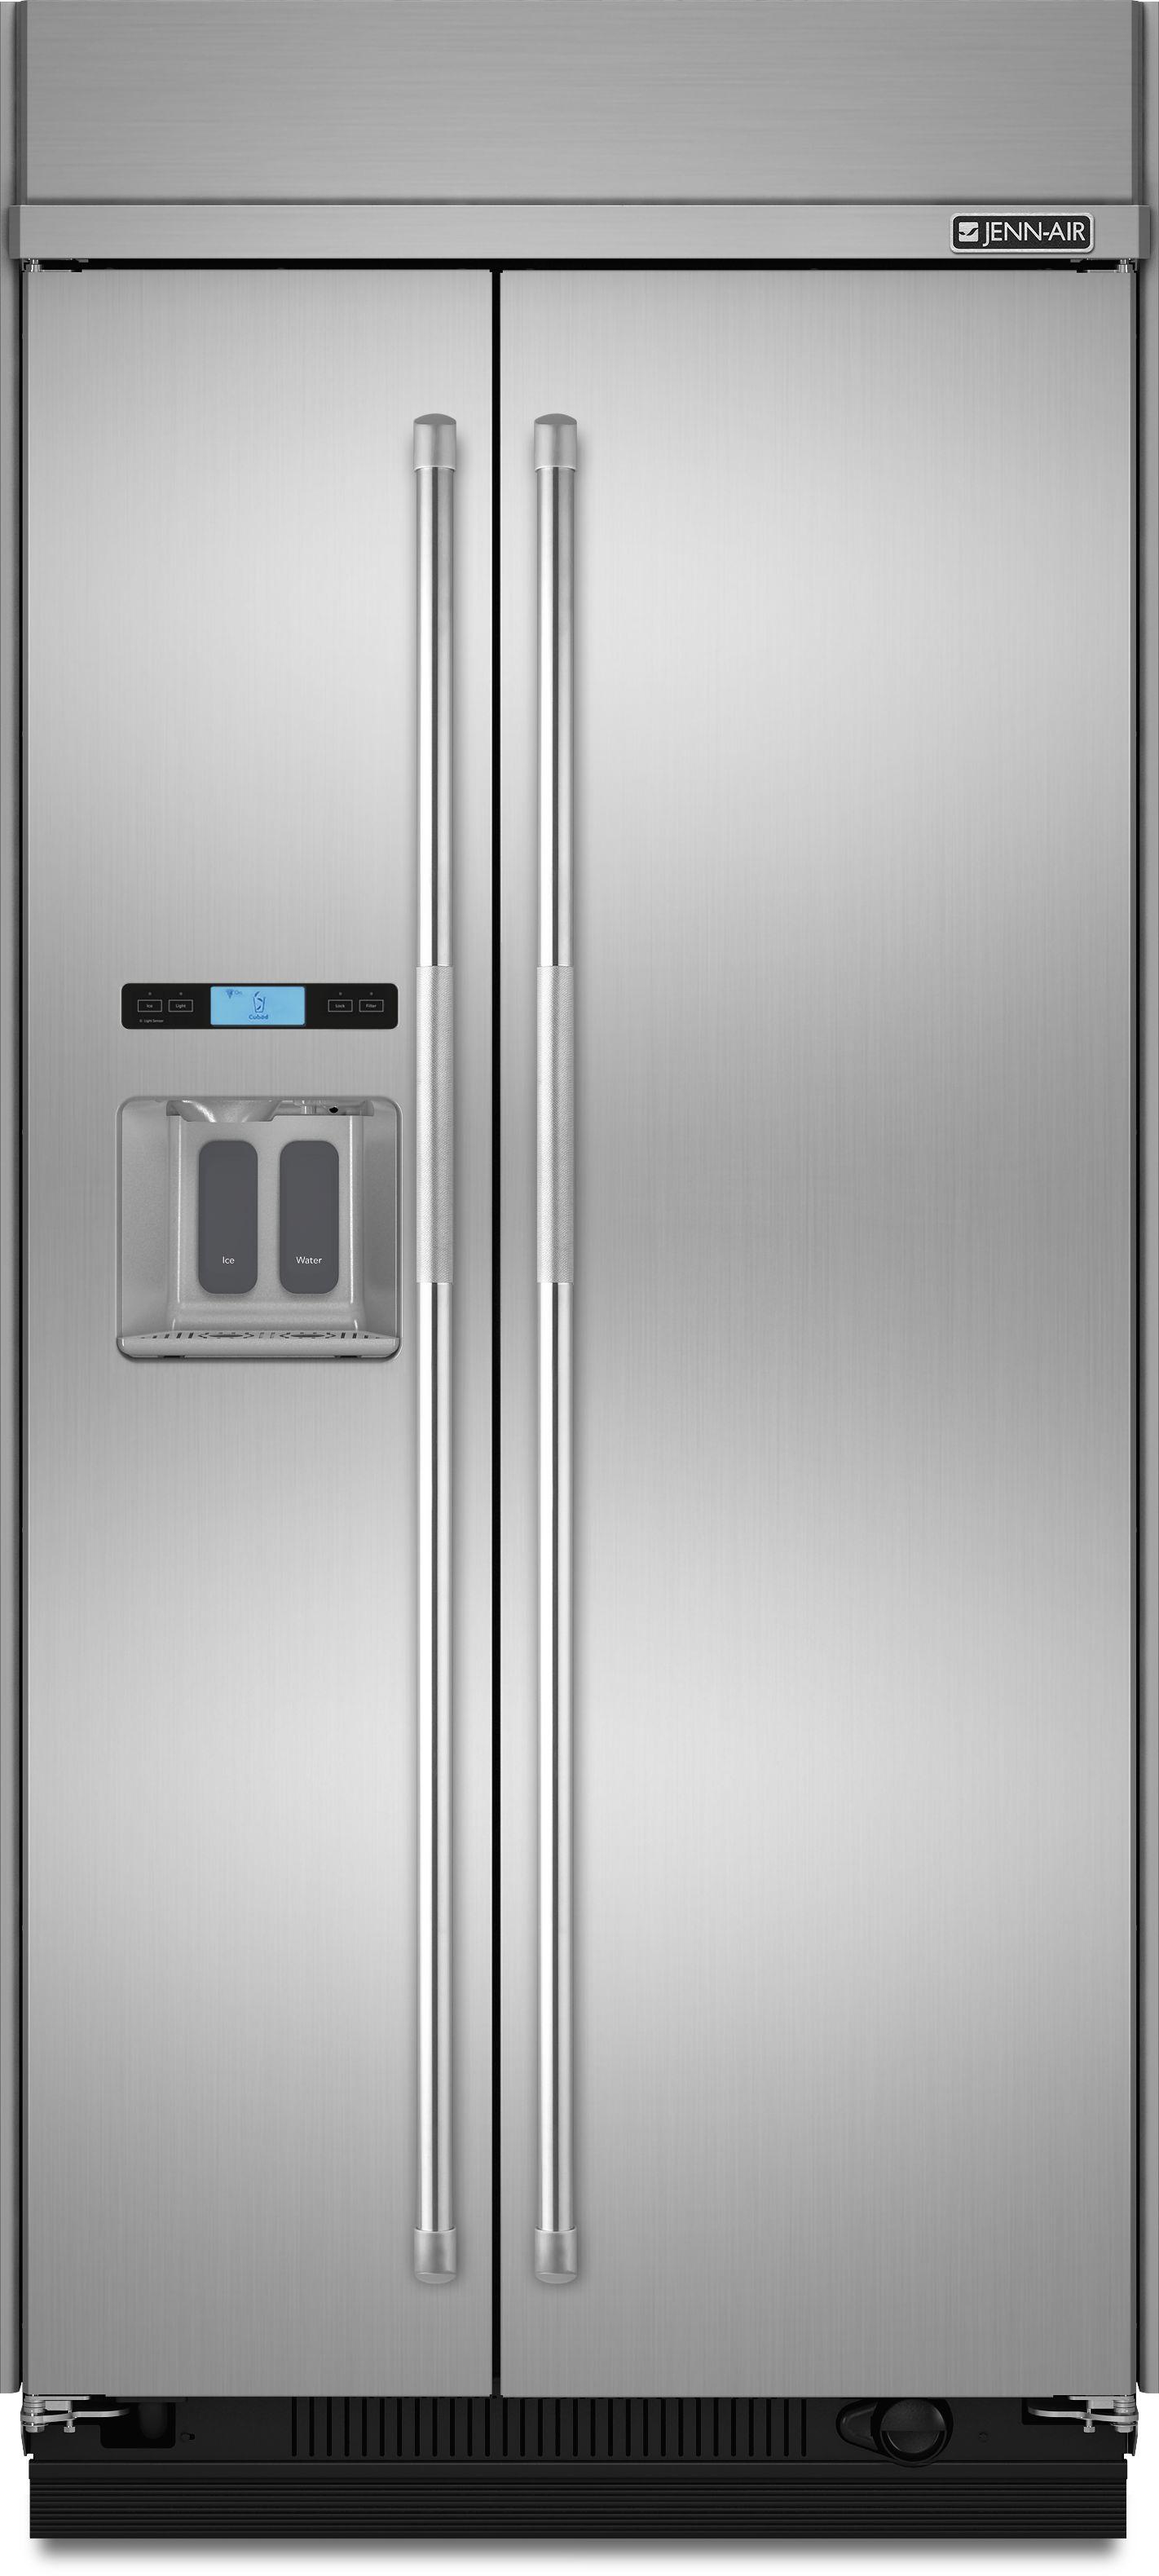 Jenn Air 174 25 02 Cu Ft Built In Side By Side Refrigerator